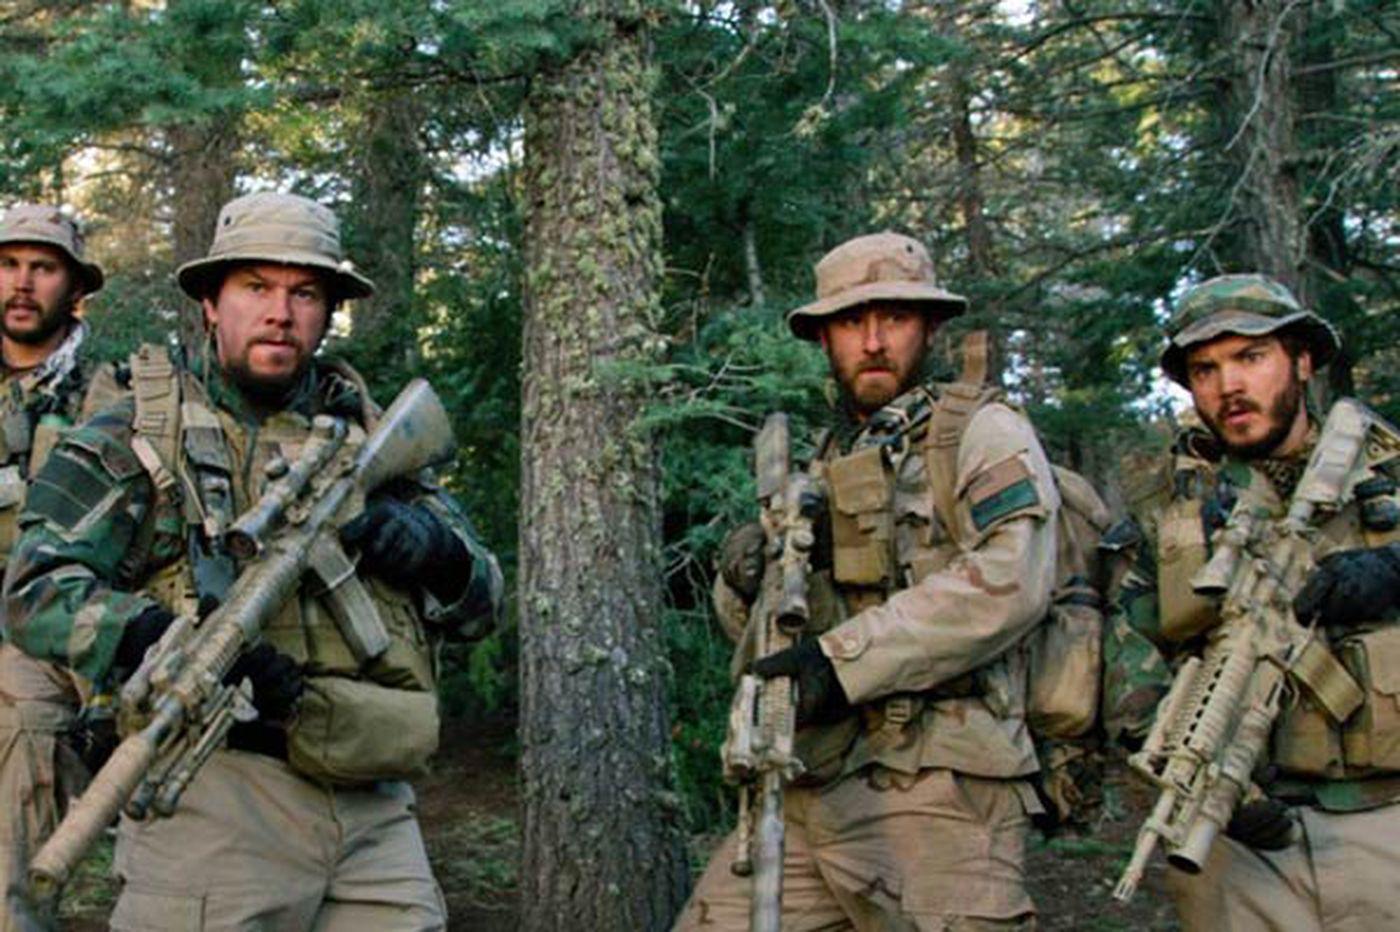 'Lone Survivor': Invincible men who bleed and break